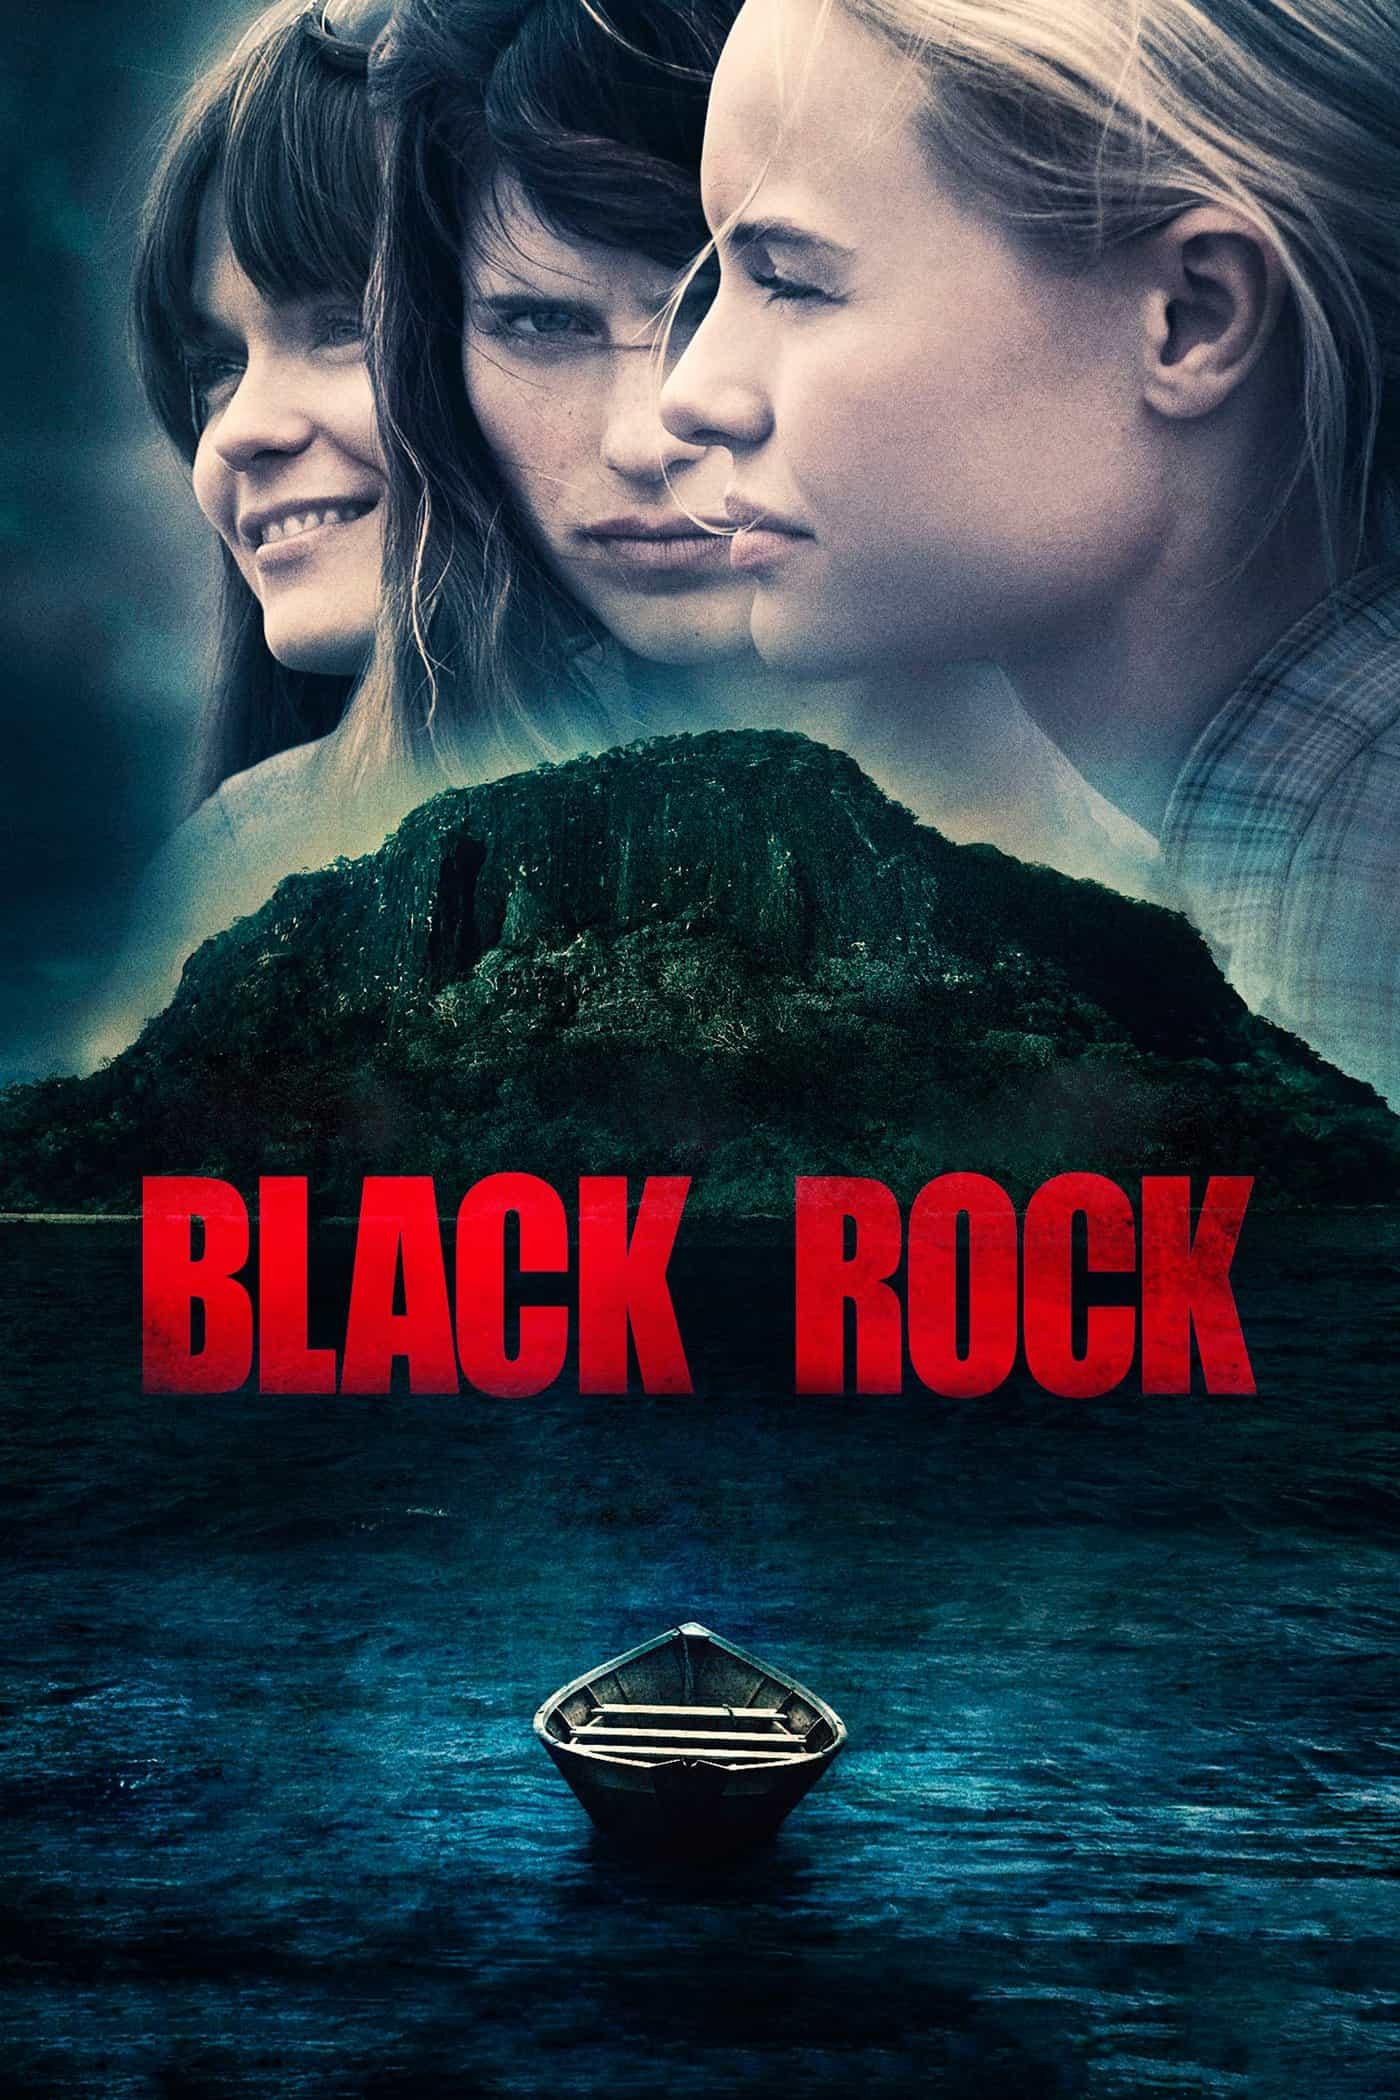 Black Rock, 2012